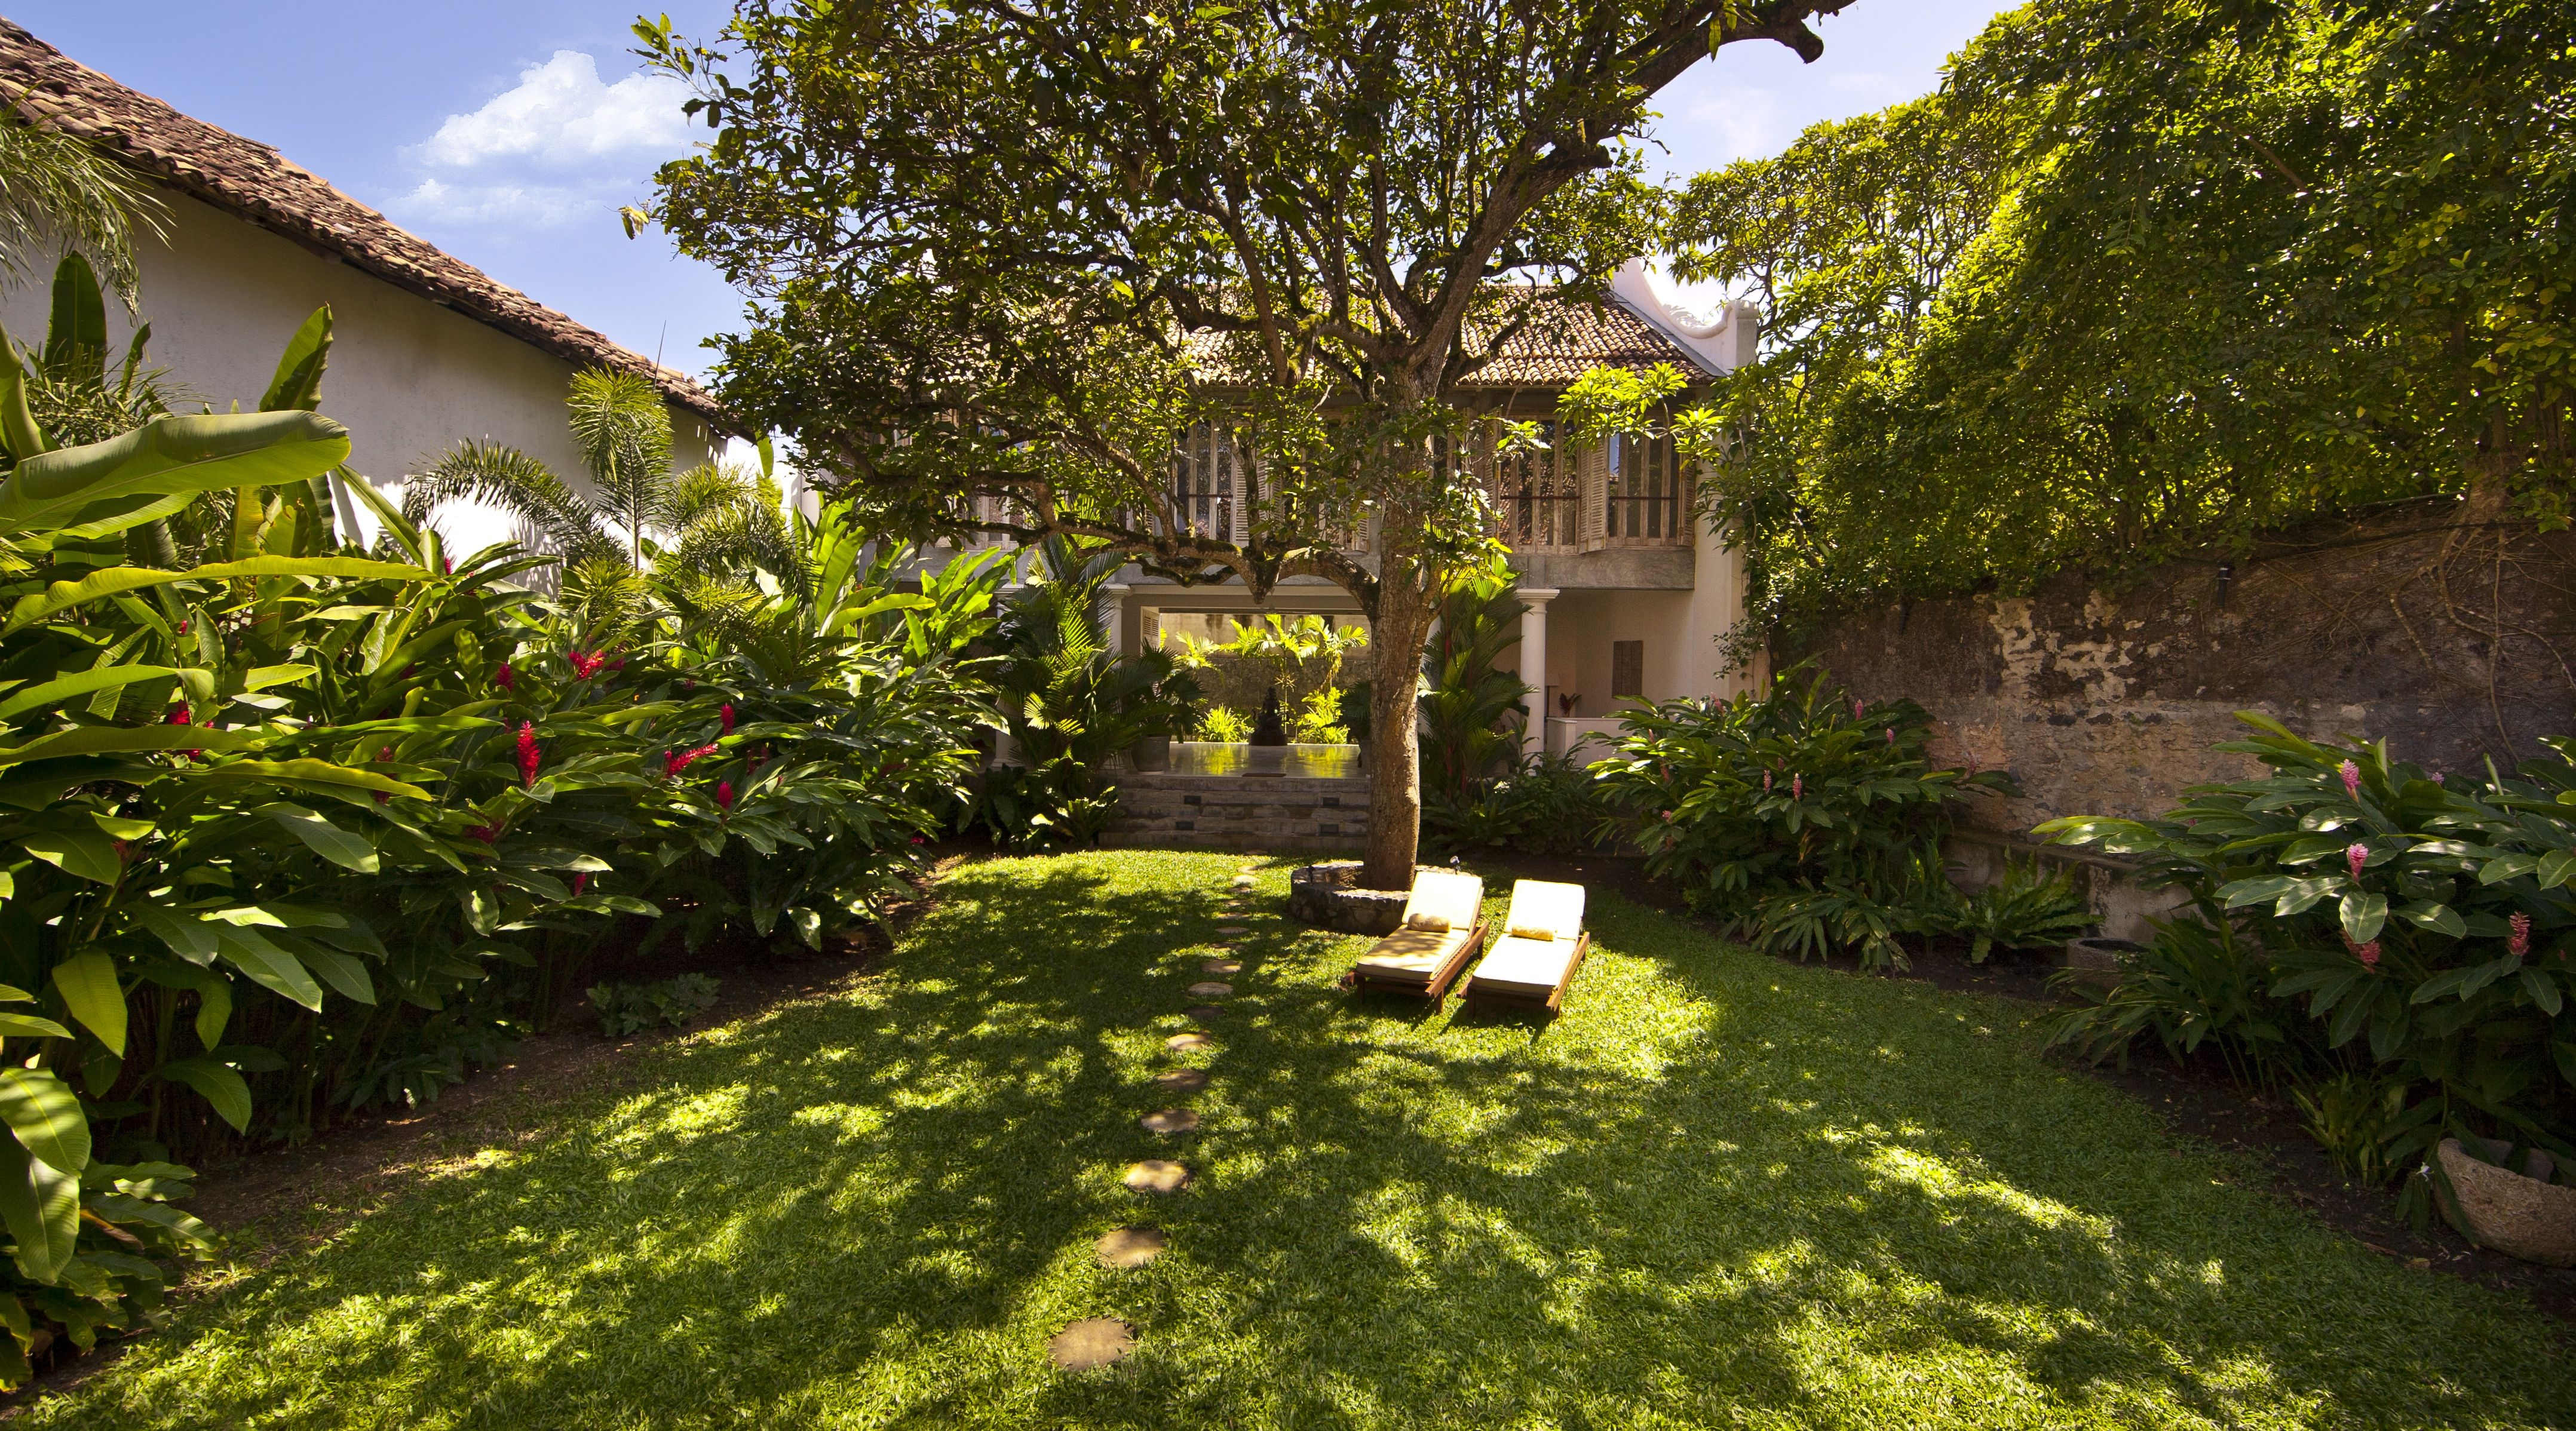 Garden; Architect Channa Daswatte renovated the house. Galle, Sri ...